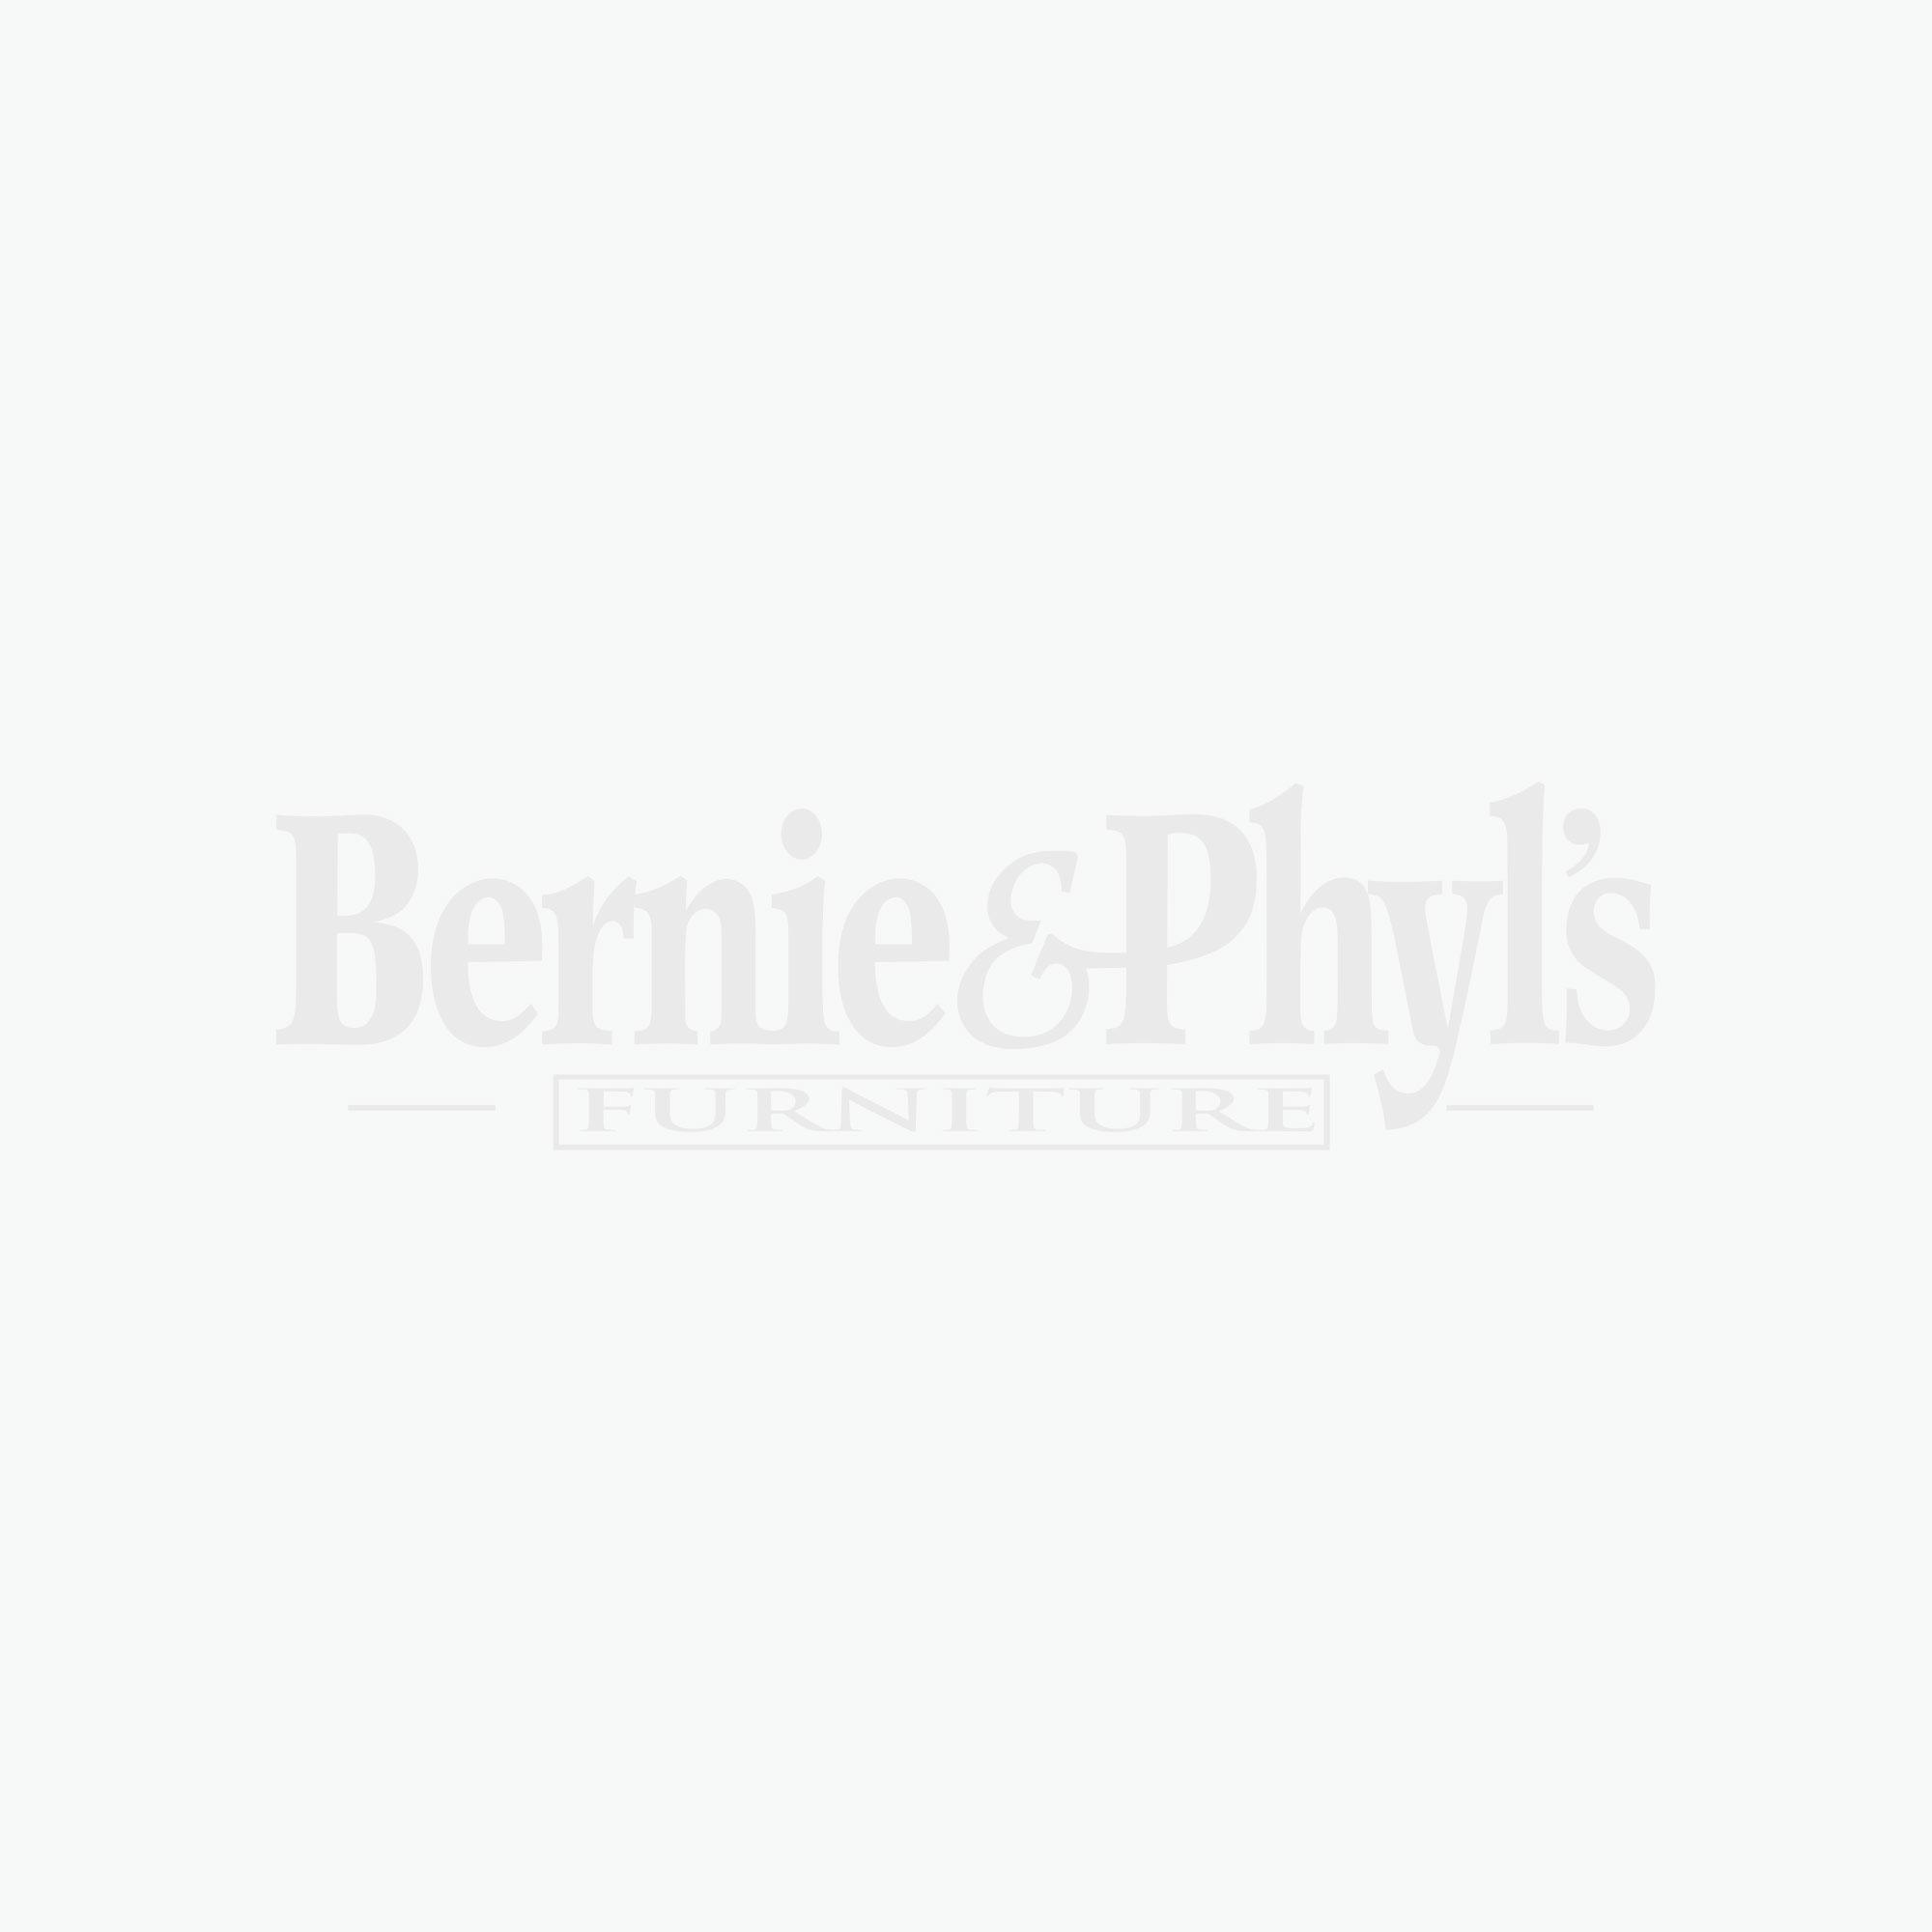 tempur pedic foundation bernie phyl s furniture by tempur pedic. Black Bedroom Furniture Sets. Home Design Ideas